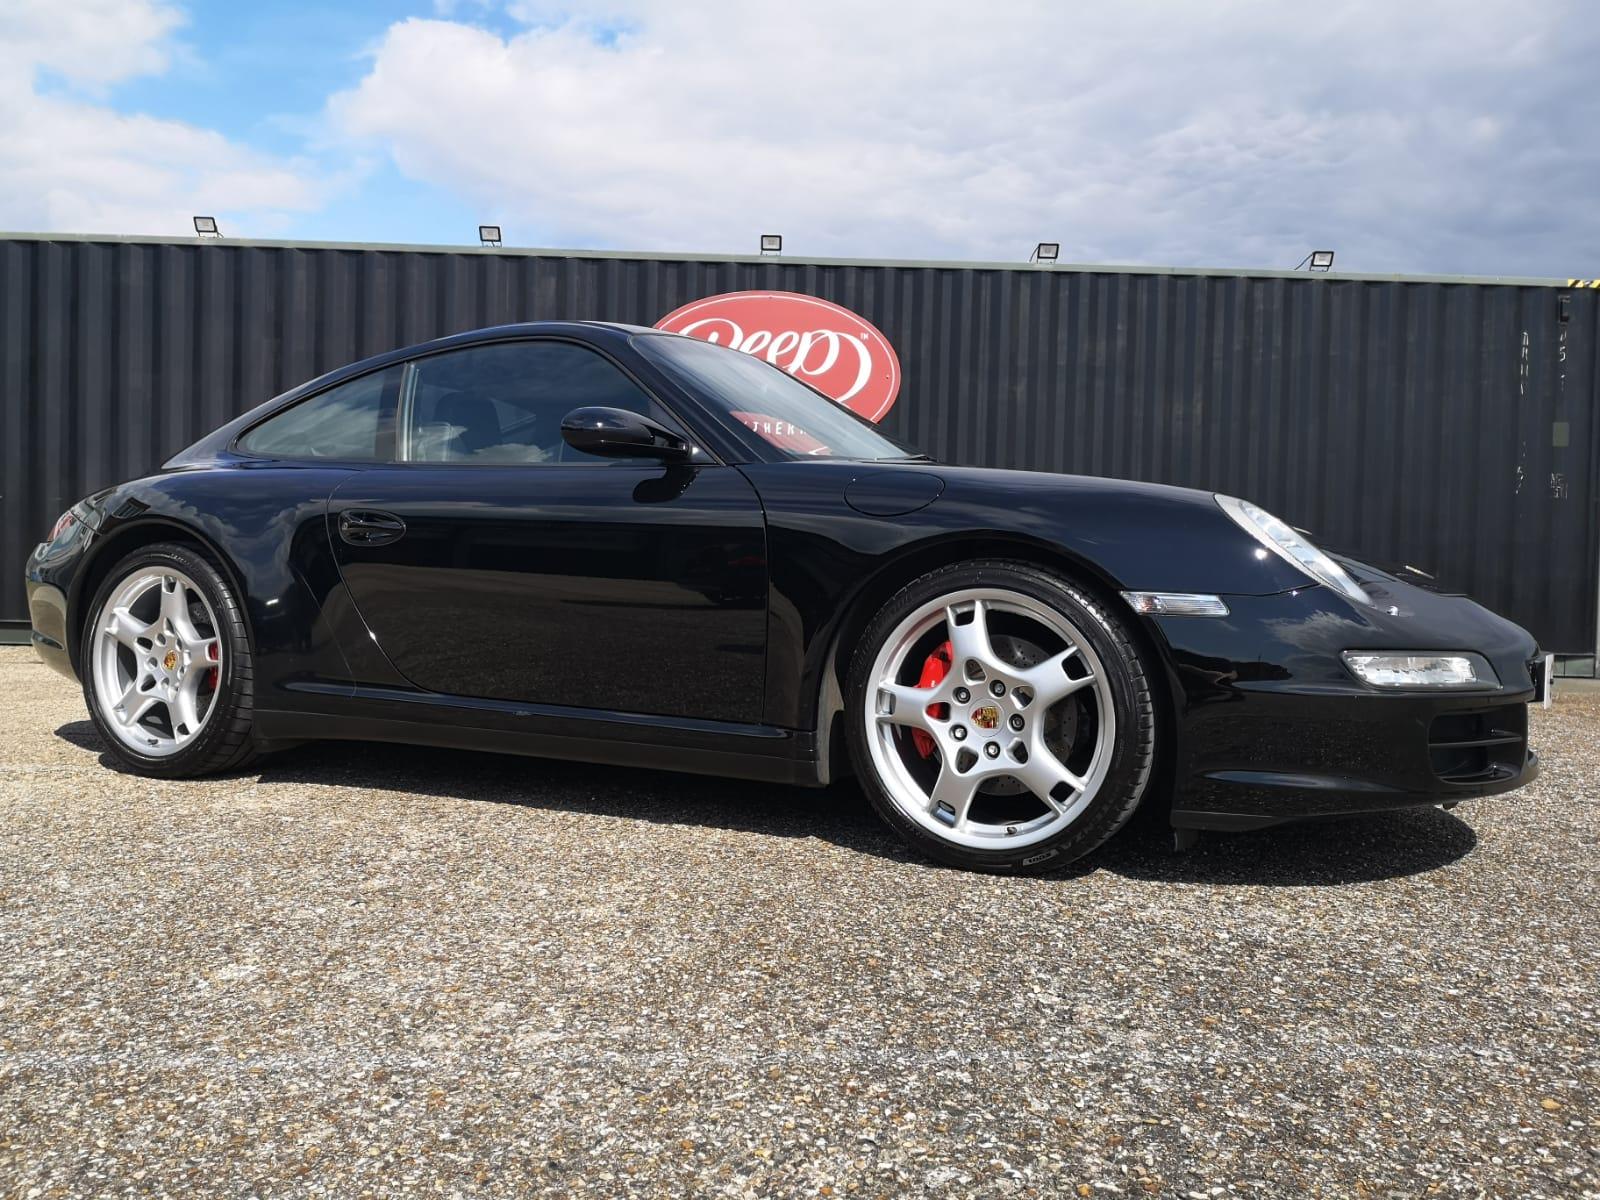 Porsche Carrera Car Wax